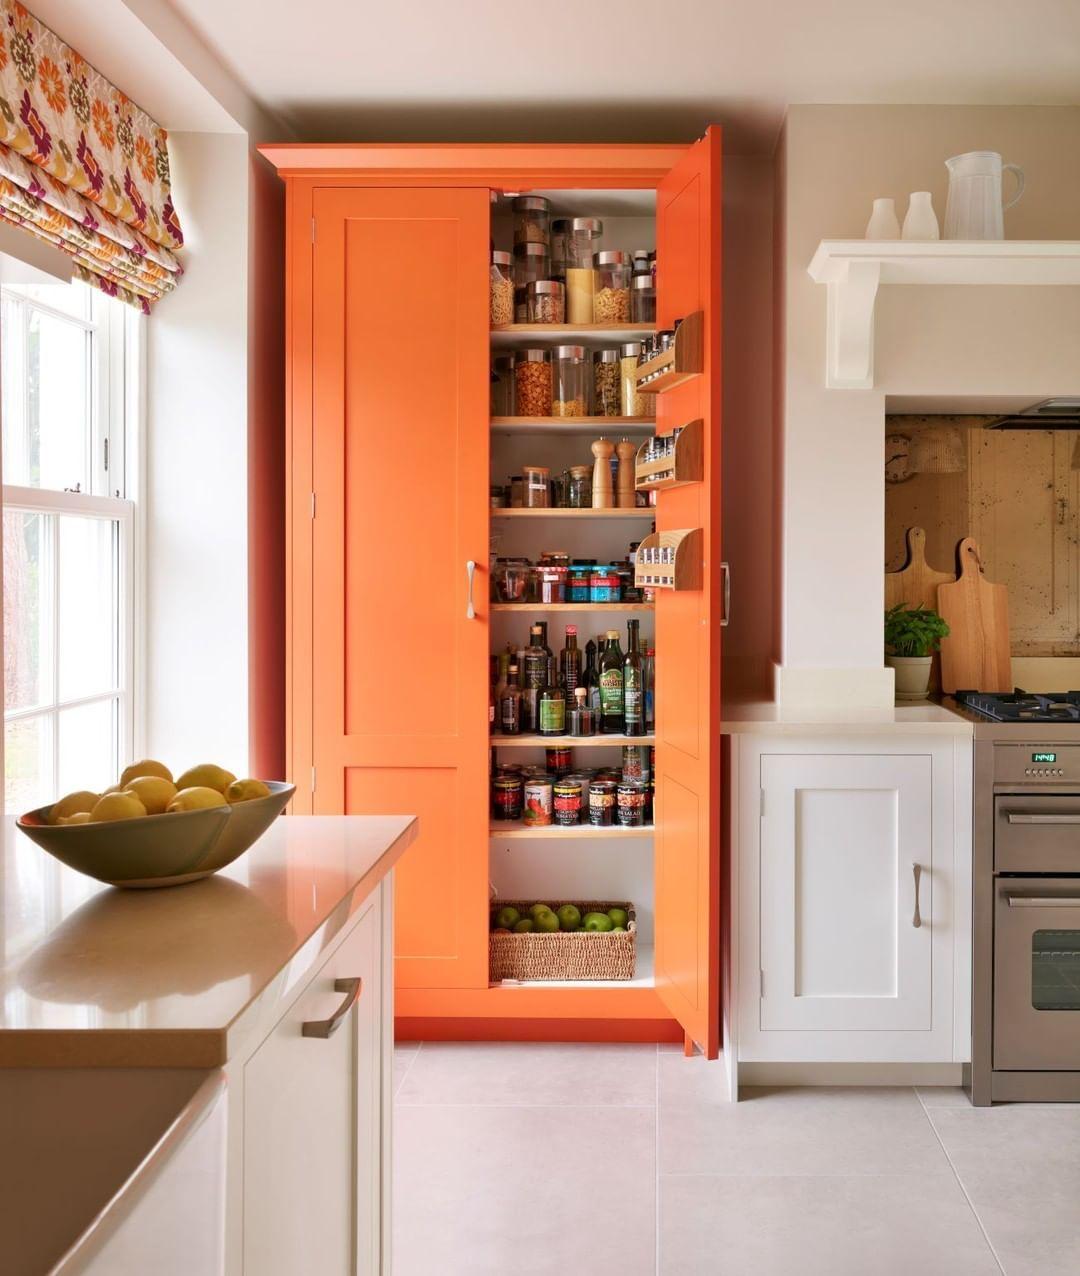 Harvey Jones Kitchens в Instagram «Orange may be a colour